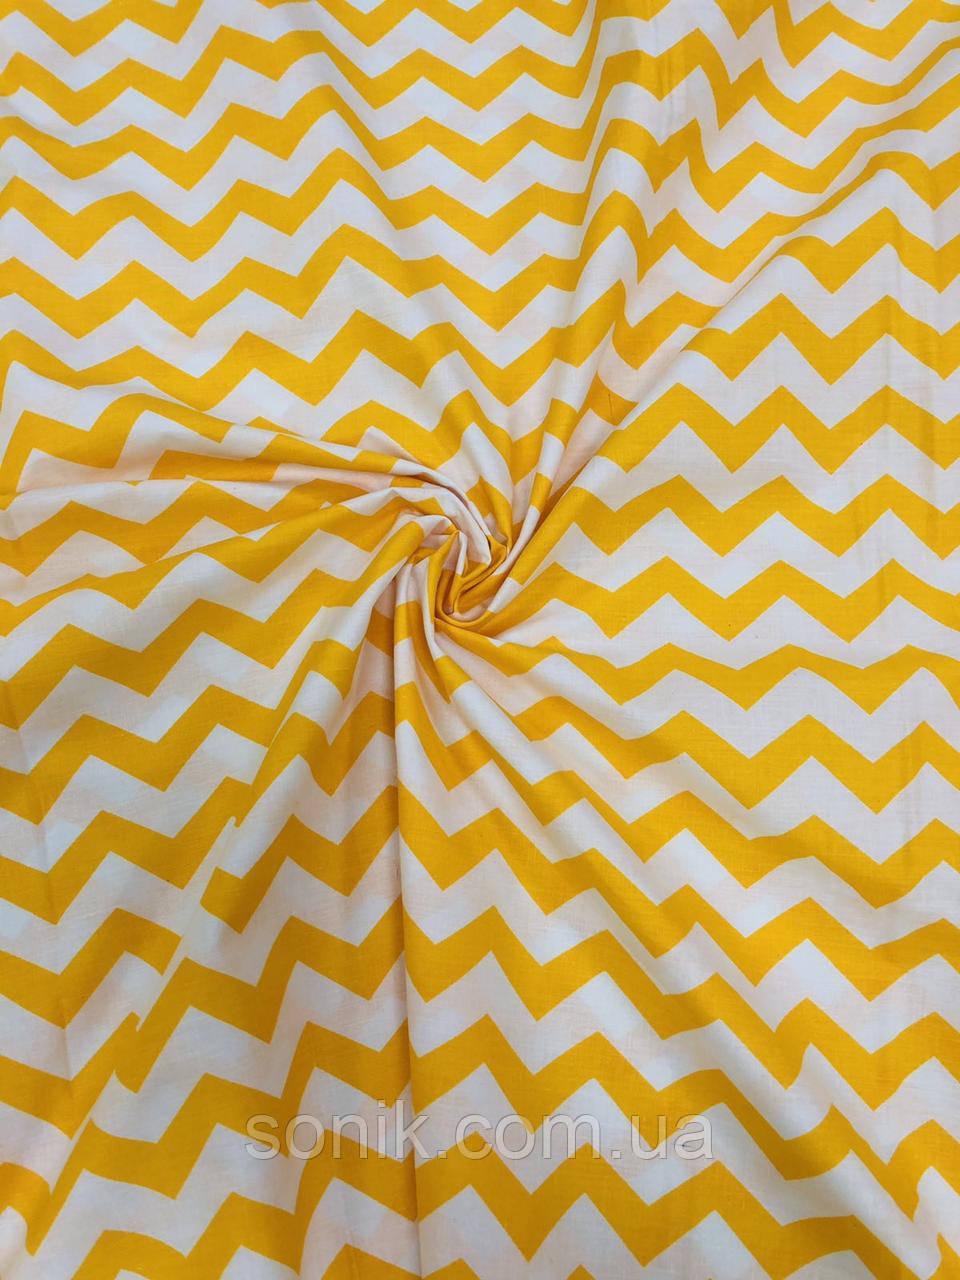 Ткань Бязь Gold Зиг-заг желтый 220 см